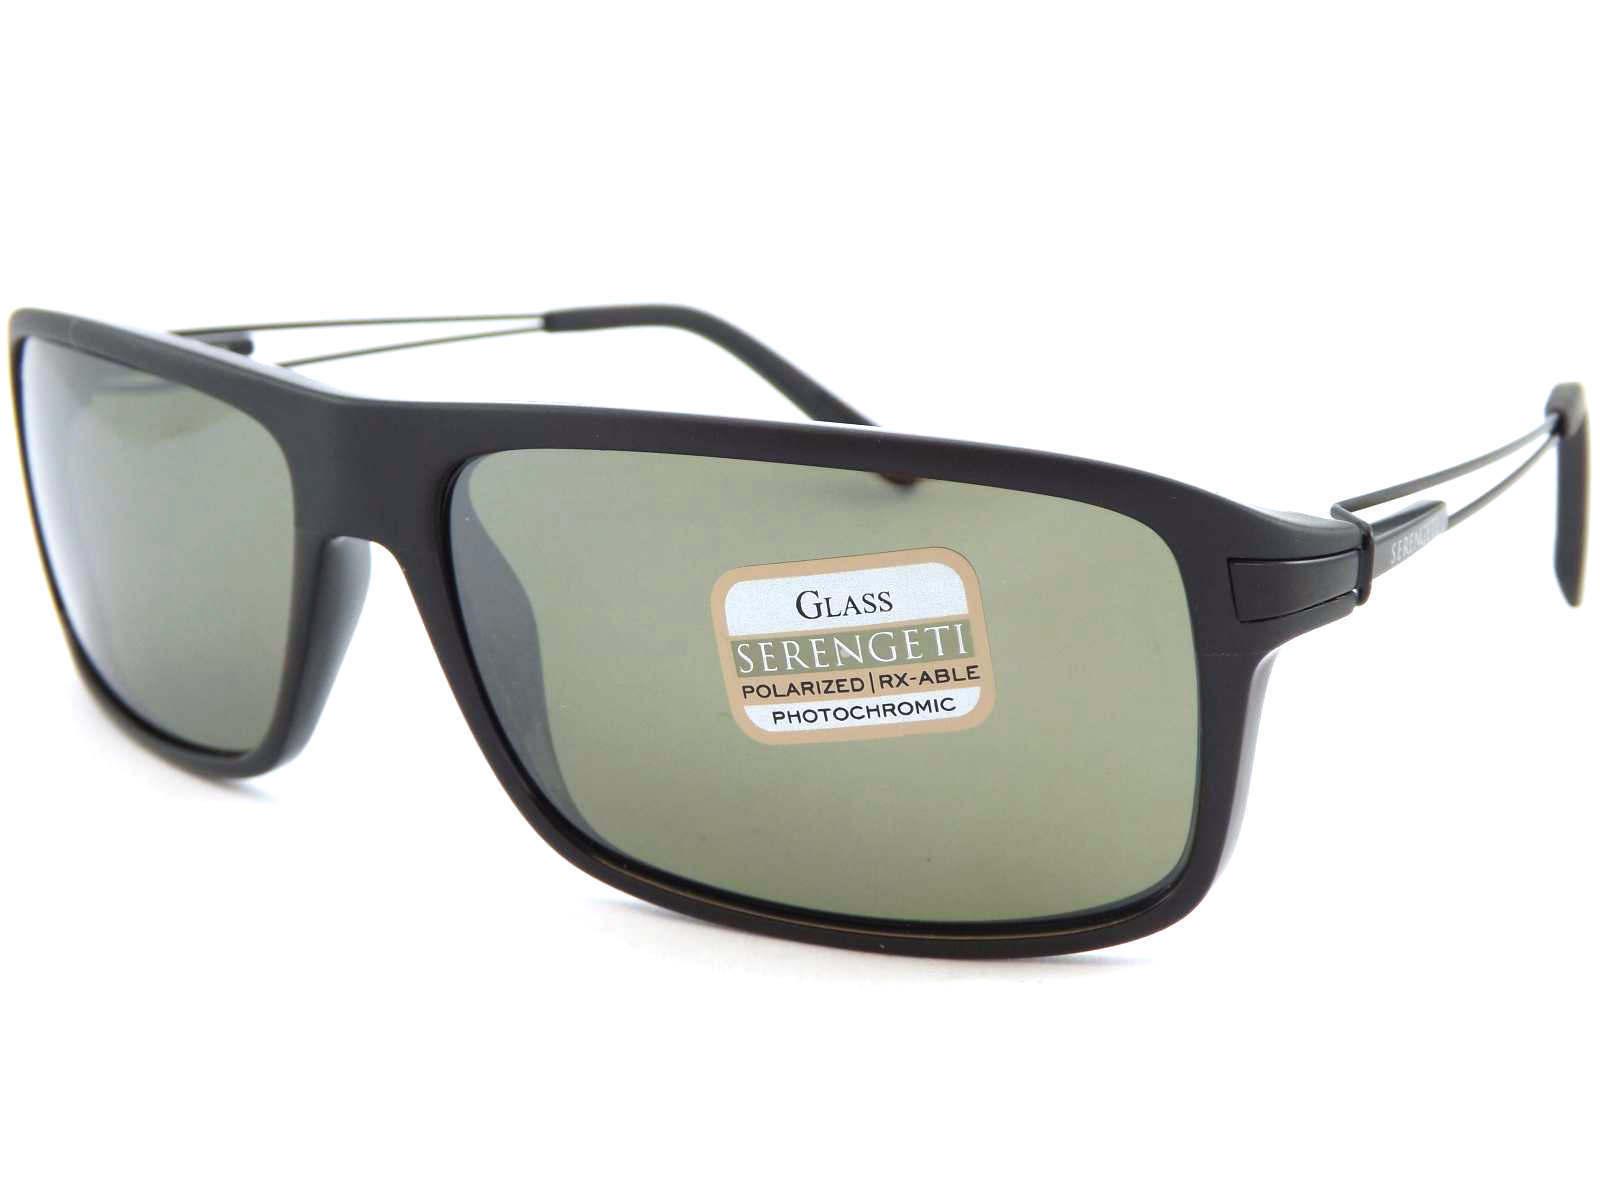 74ccb2dbc7c8 Serengeti Rivoli Sunglasses - 7916 - Shy/Mtt and 50 similar items